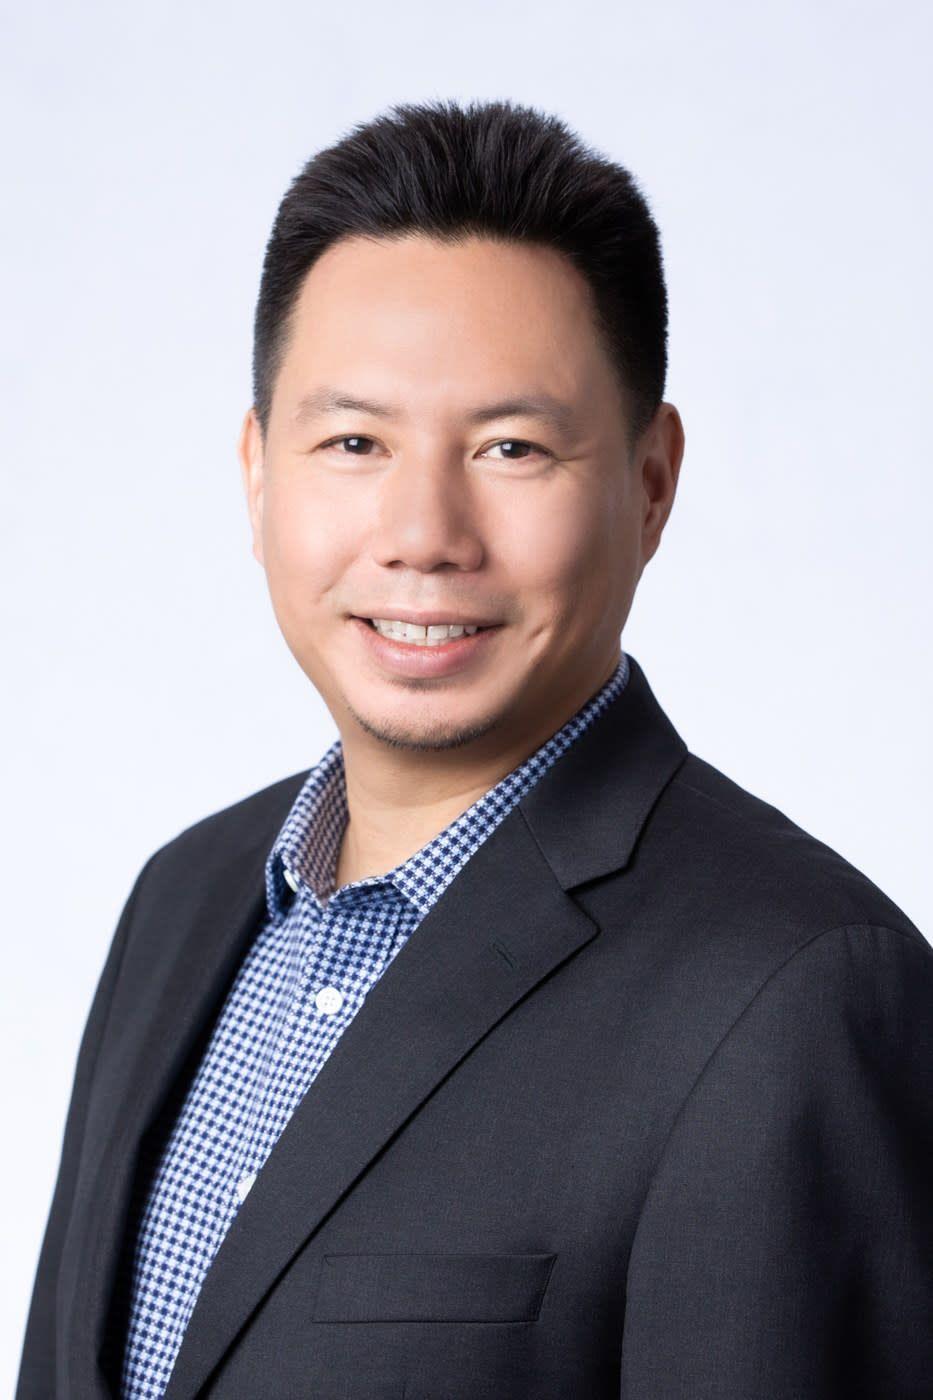 Terry Lo named President, CEO of Vizgen, Vizgen